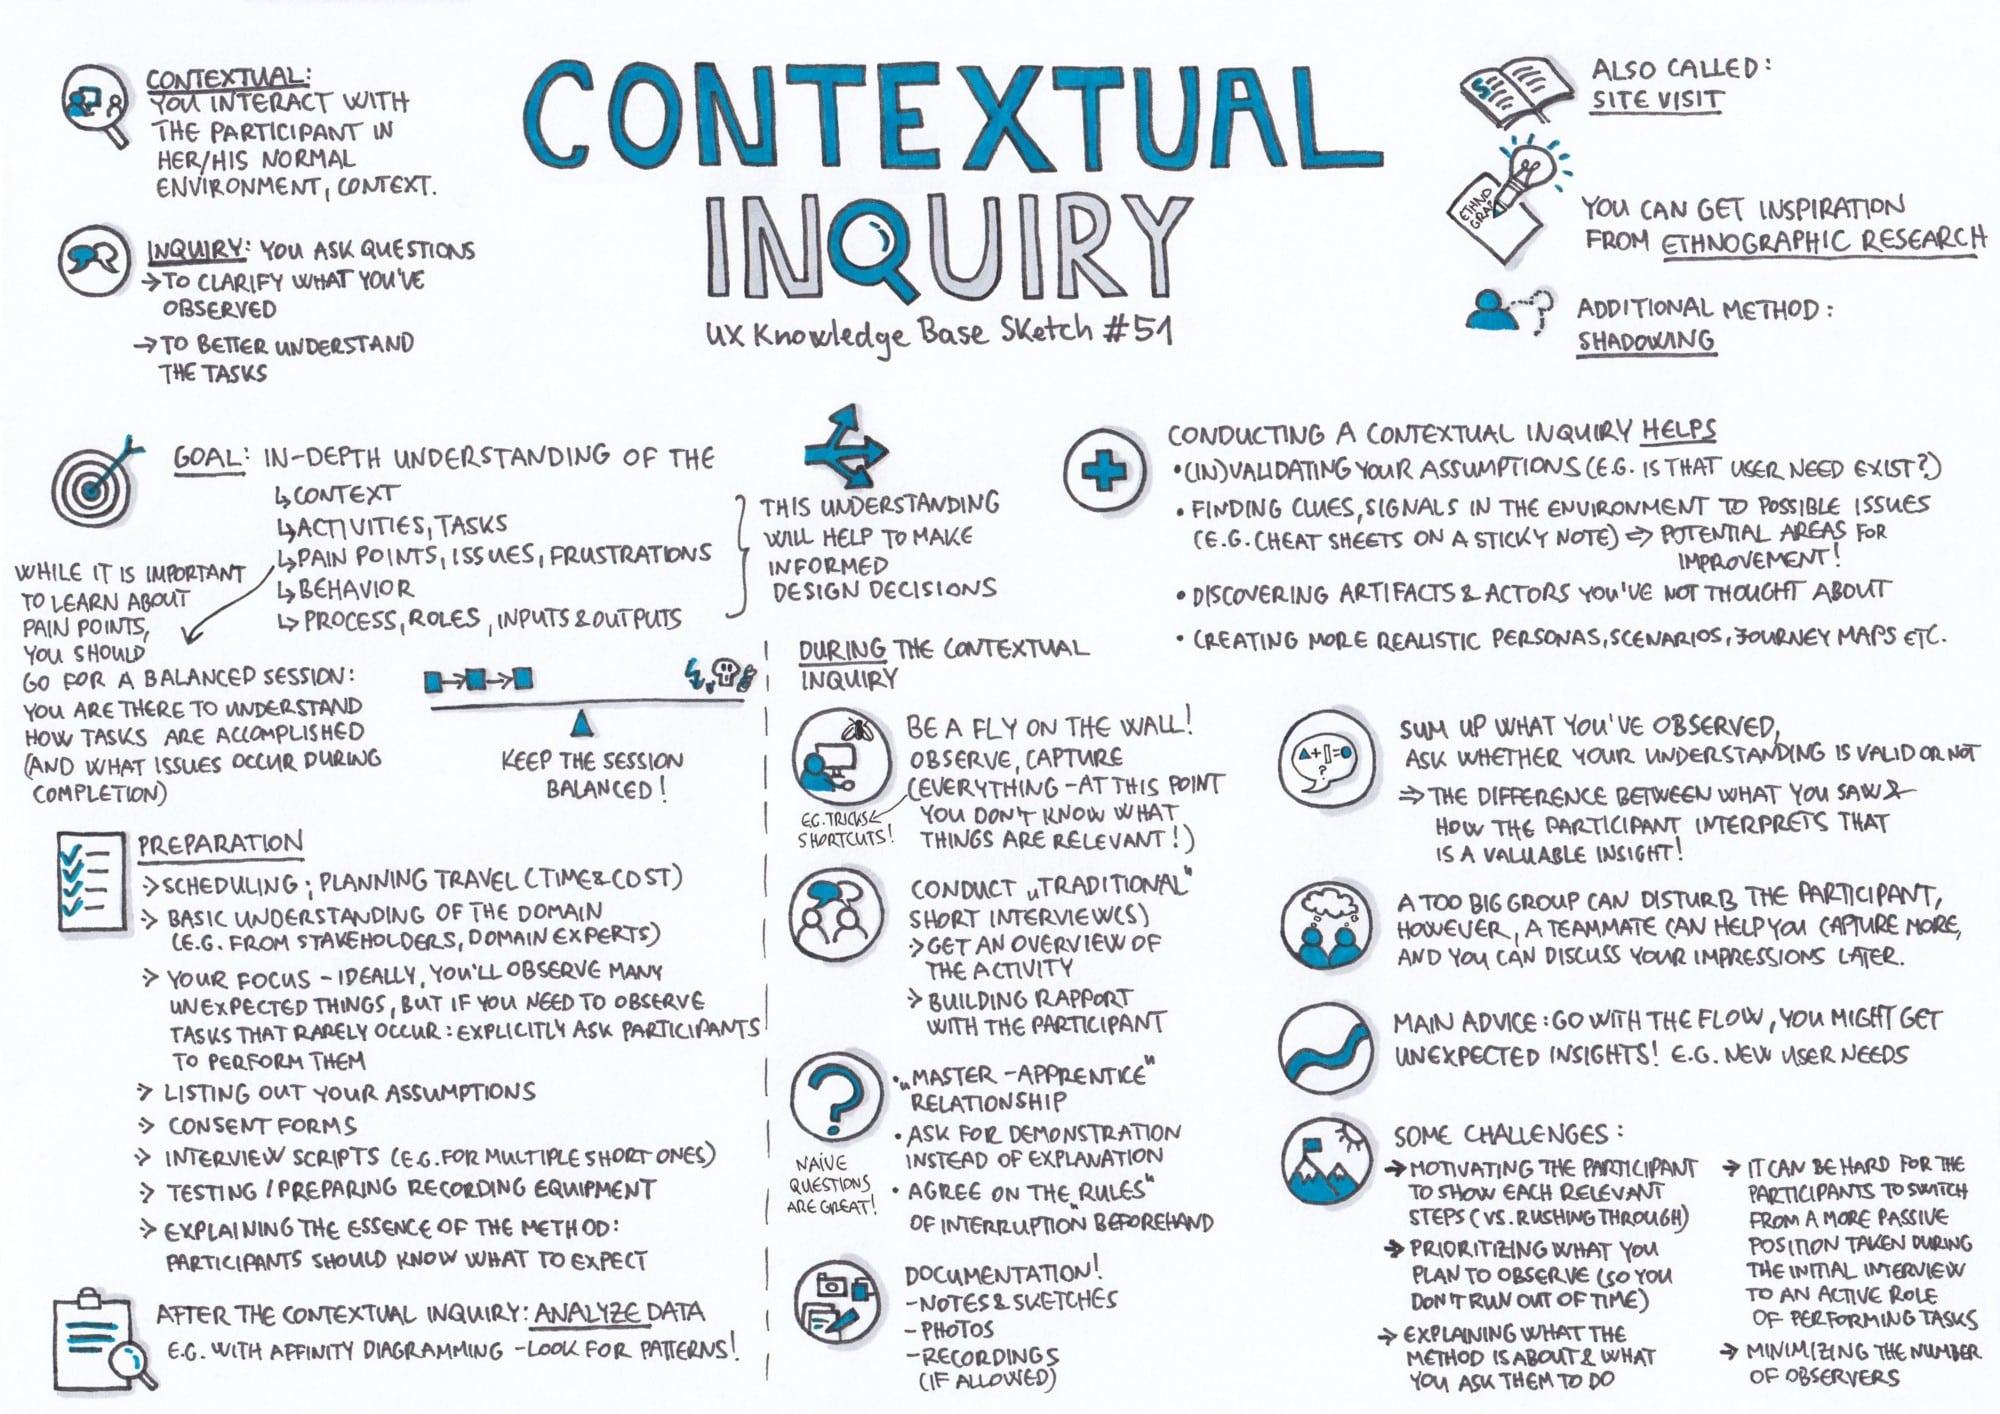 Contextual inquiry in summary